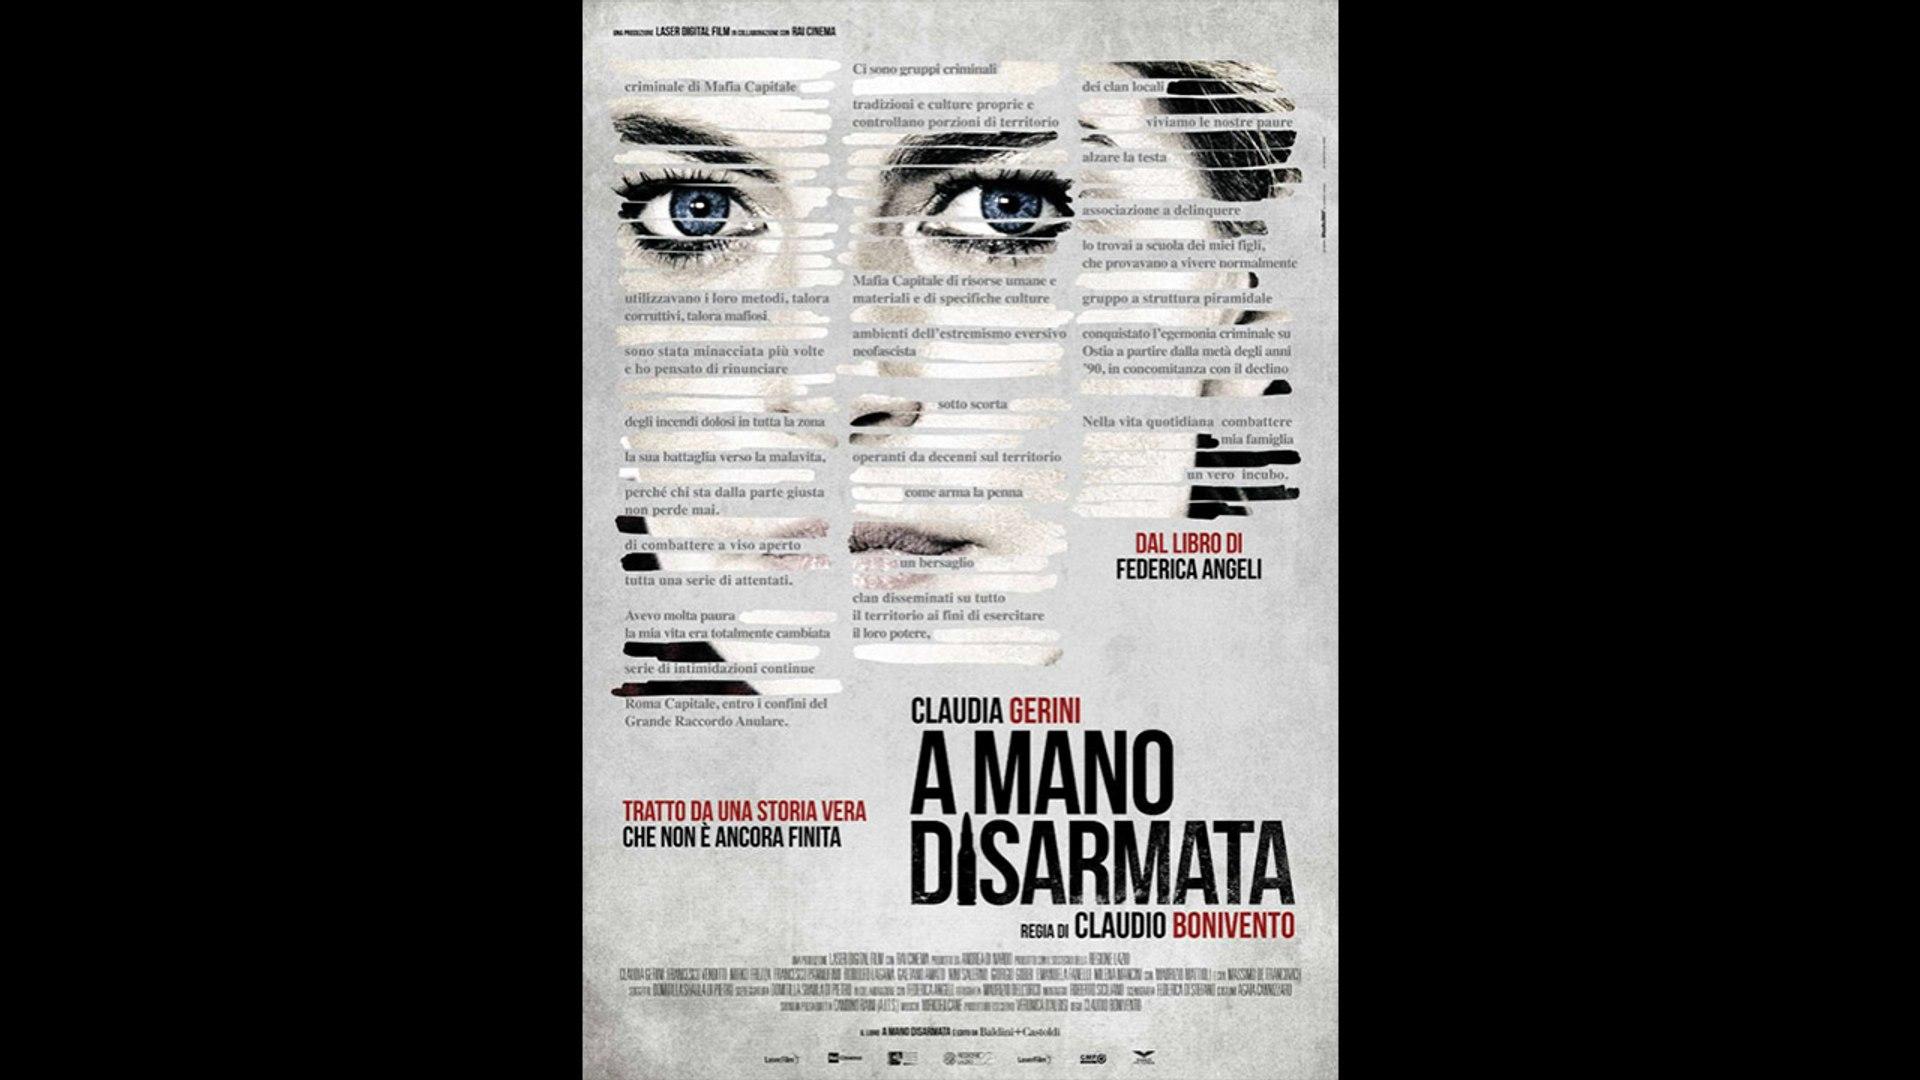 A Mano Disarmata (2019).h264 MP3 WEBDLRIP ITA - Video Dailymotion